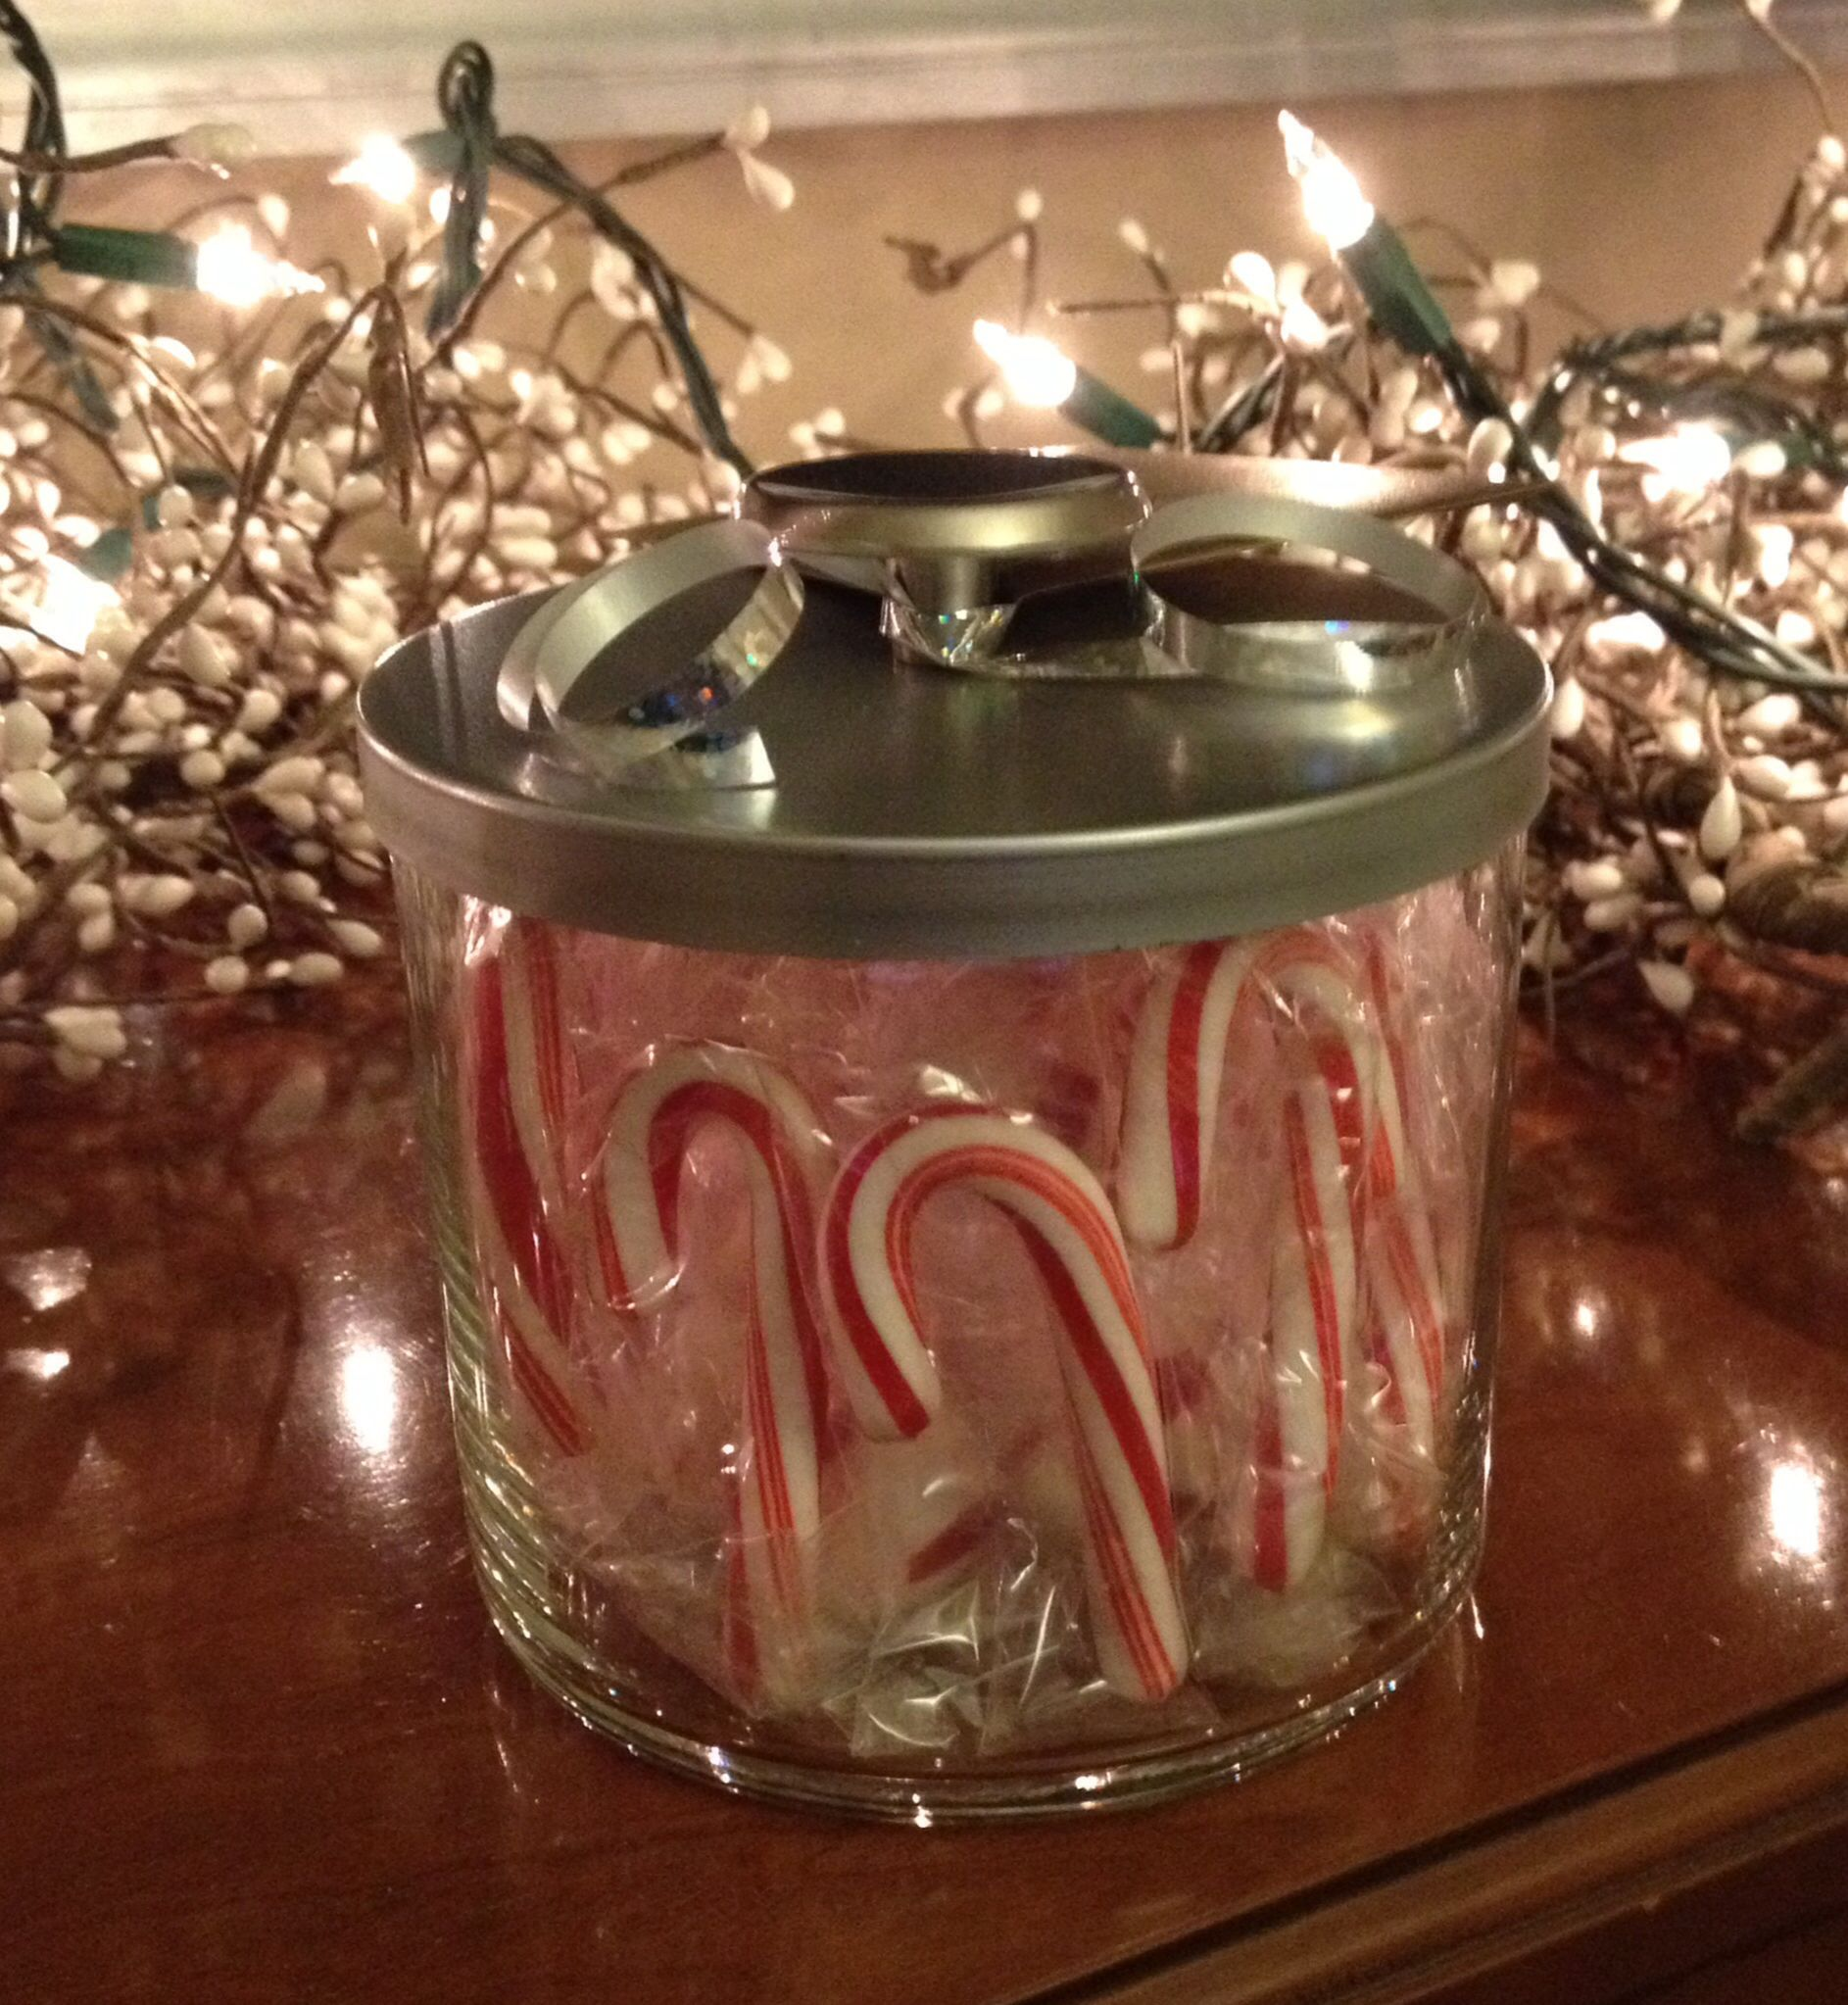 recycle reuse bath body candle jar diy diy yankee candle jars reuse candle jars. Black Bedroom Furniture Sets. Home Design Ideas